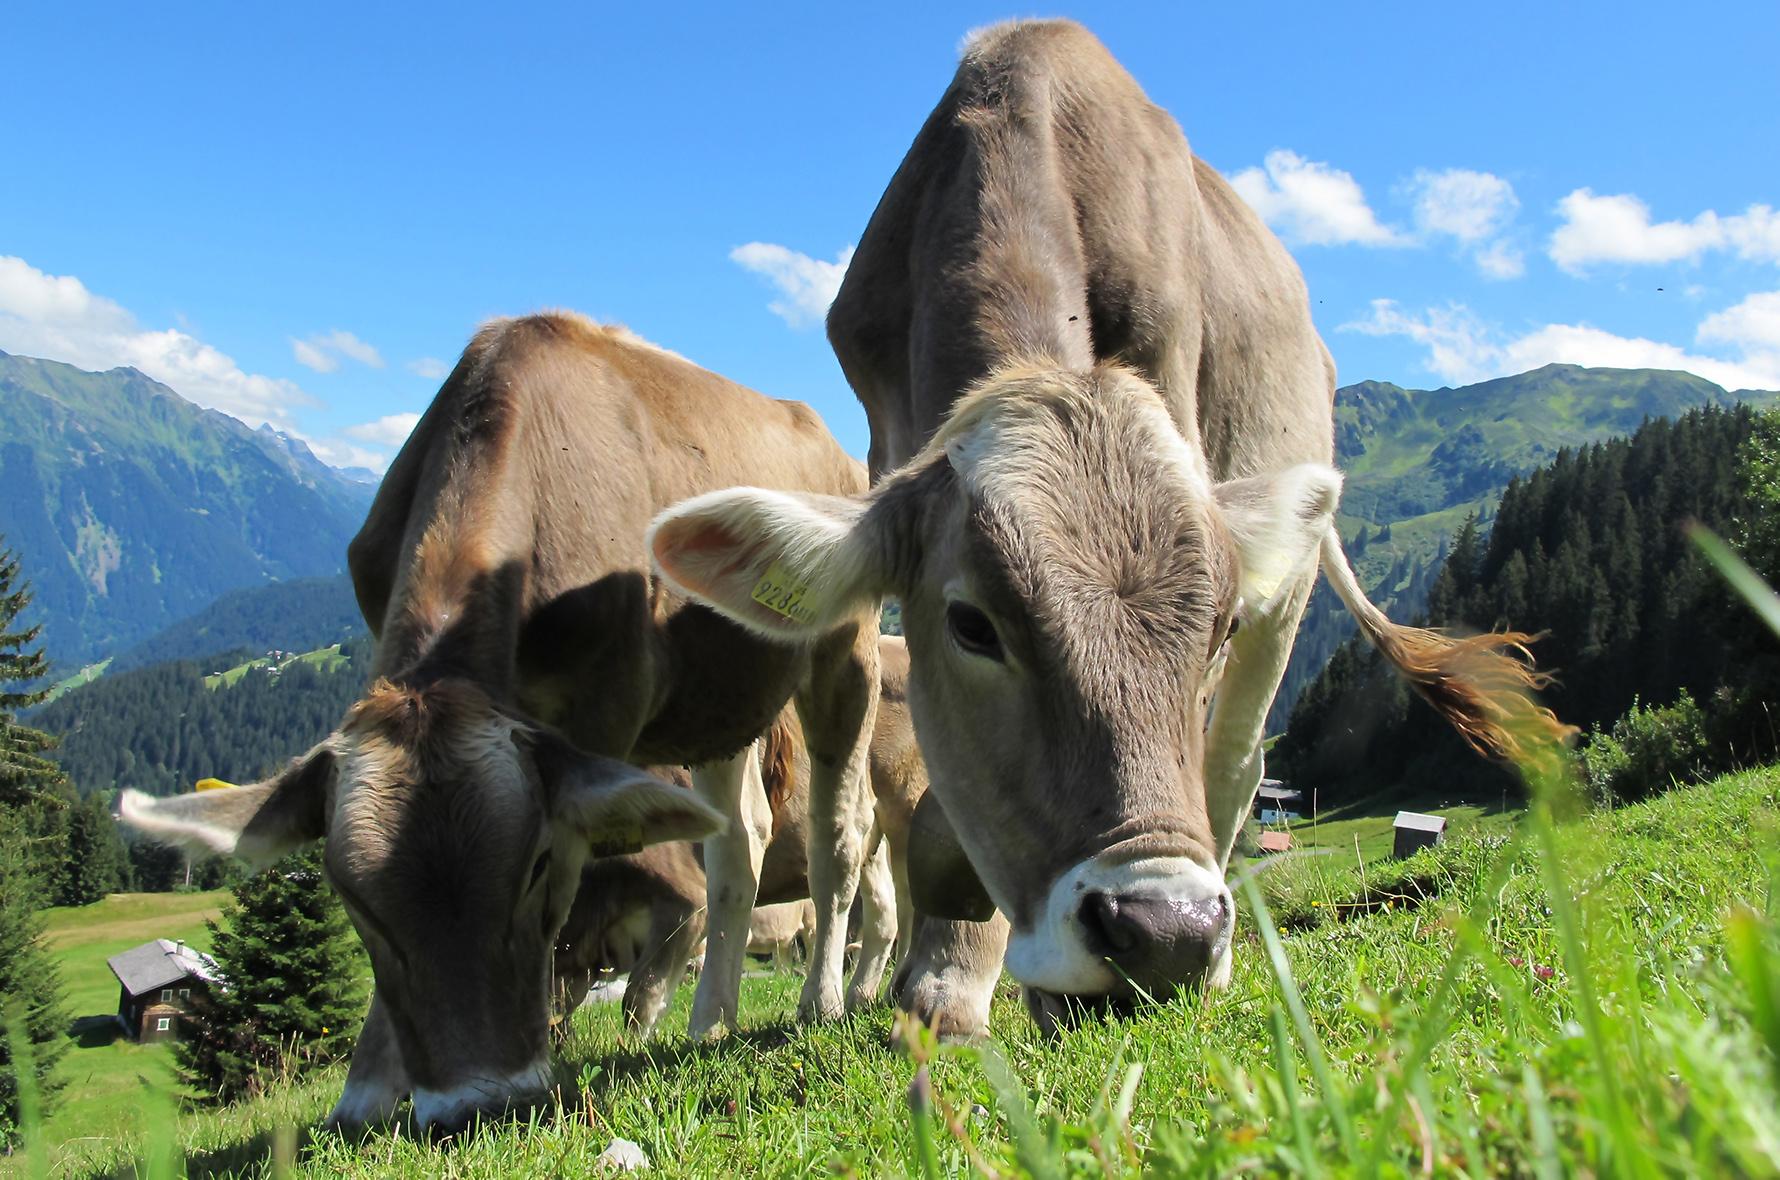 Global methane emissions reach record high